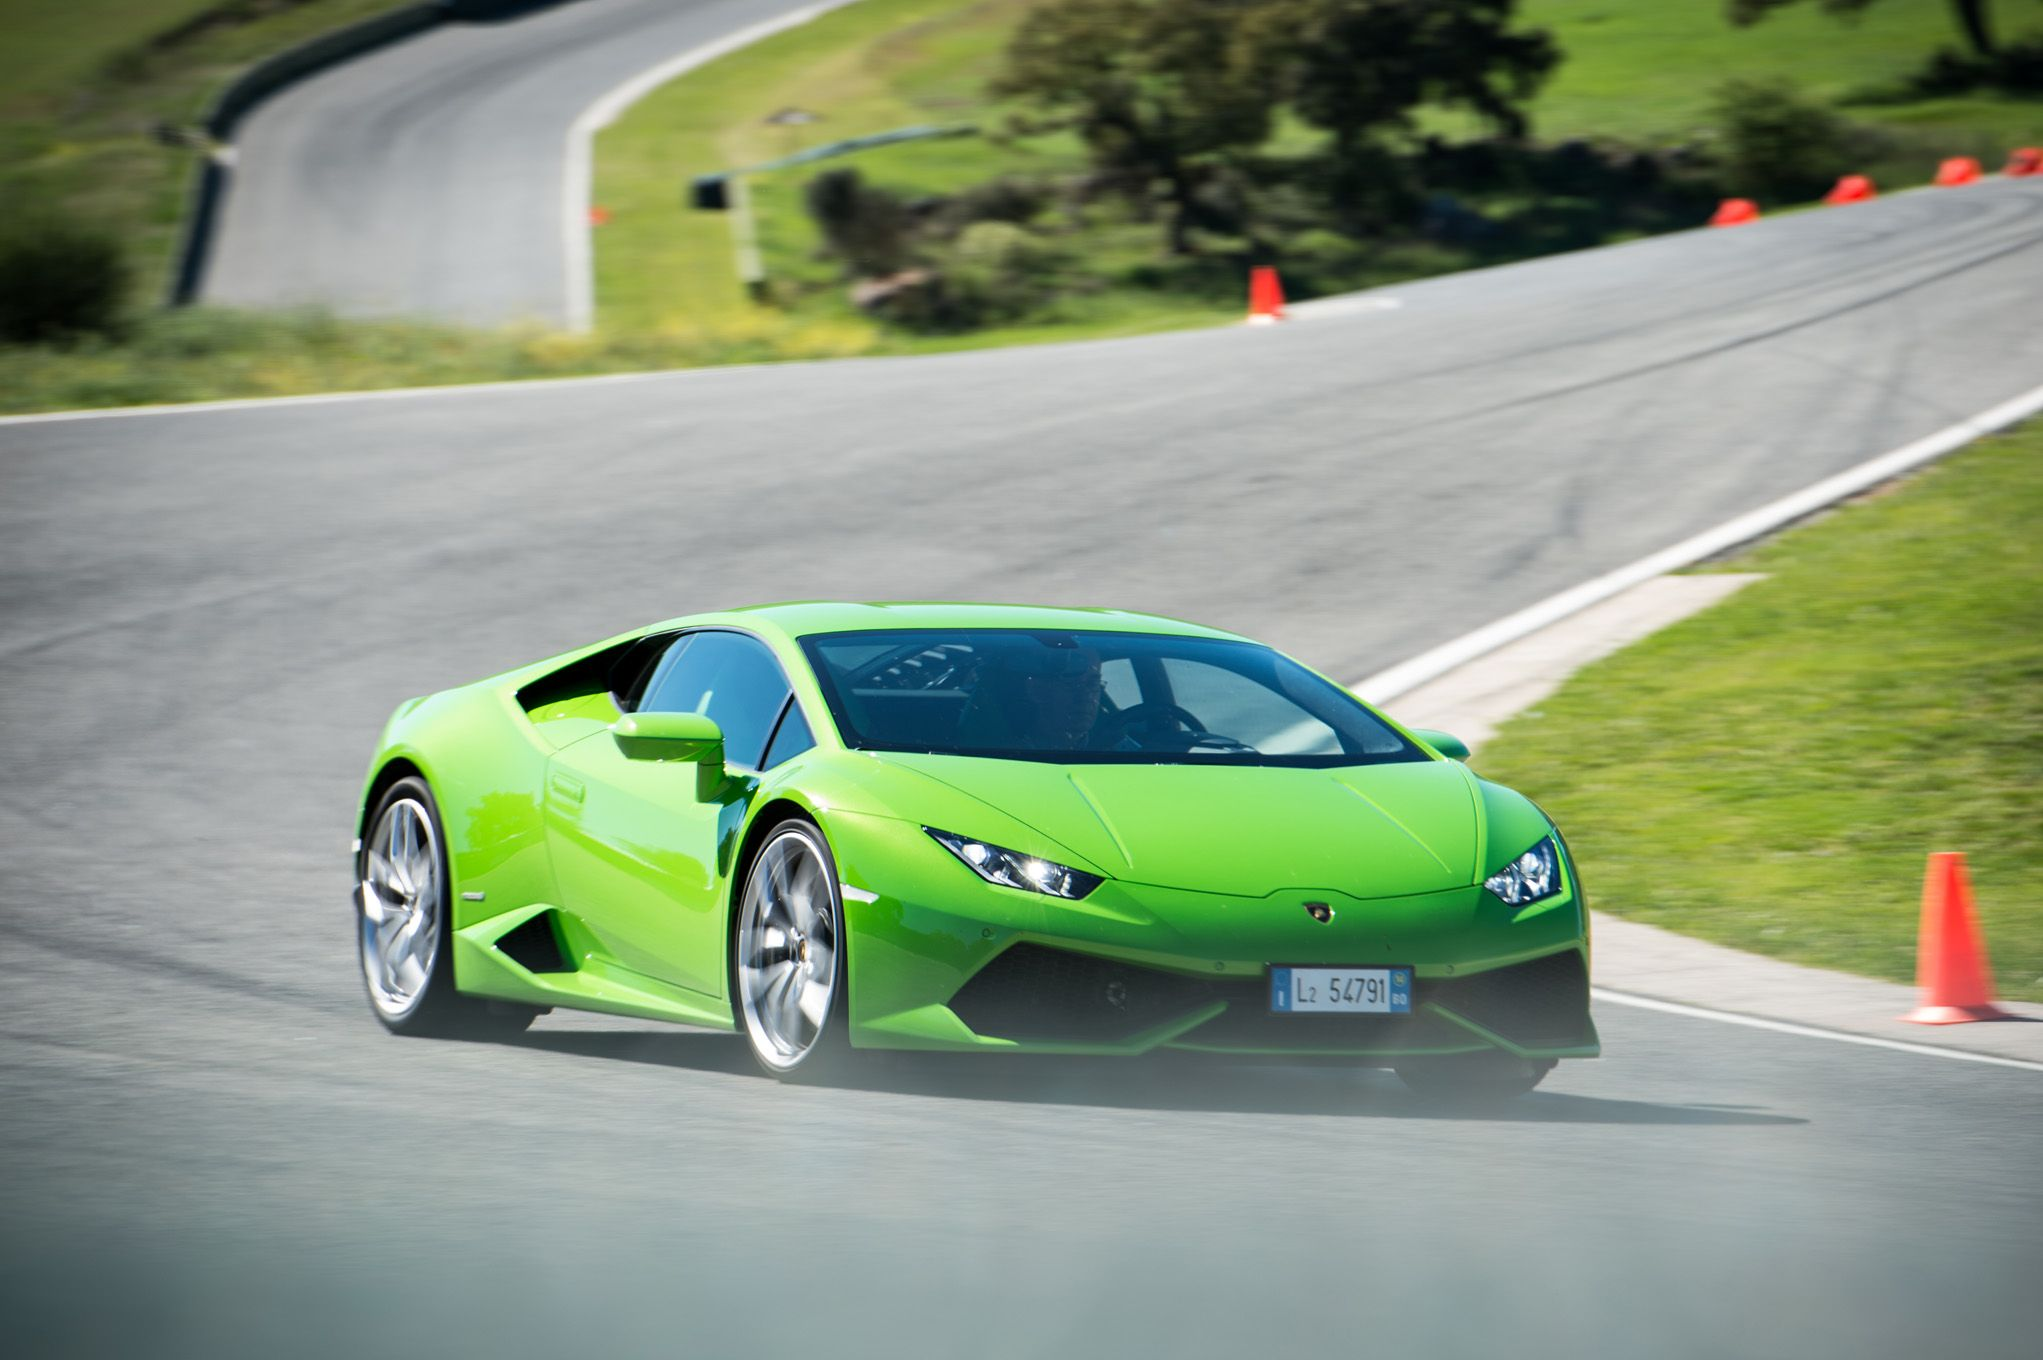 98dc8fae6f0cac542a87ffe0bc4ecd94 Marvelous Lamborghini Huracan Price In Uae Cars Trend